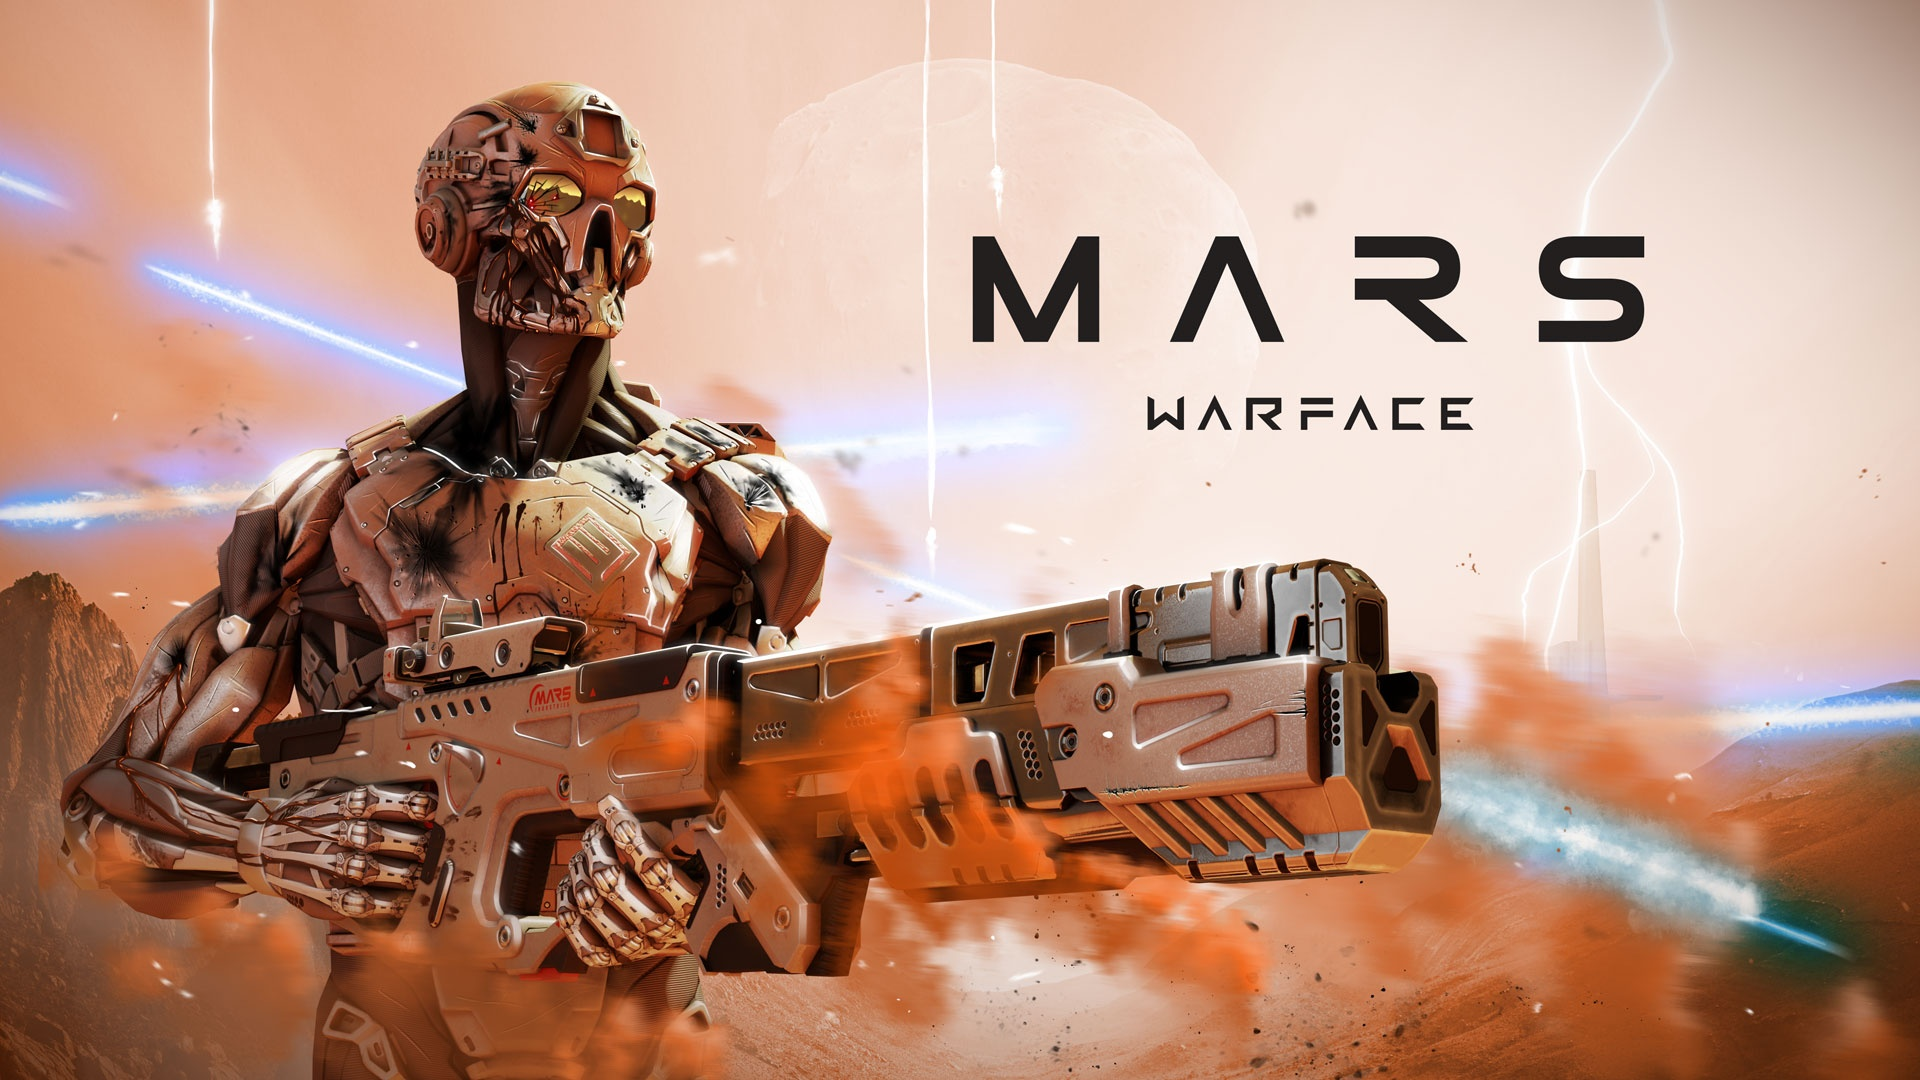 На взлёт! Спецоперация «Марс» в Warface уже открылась